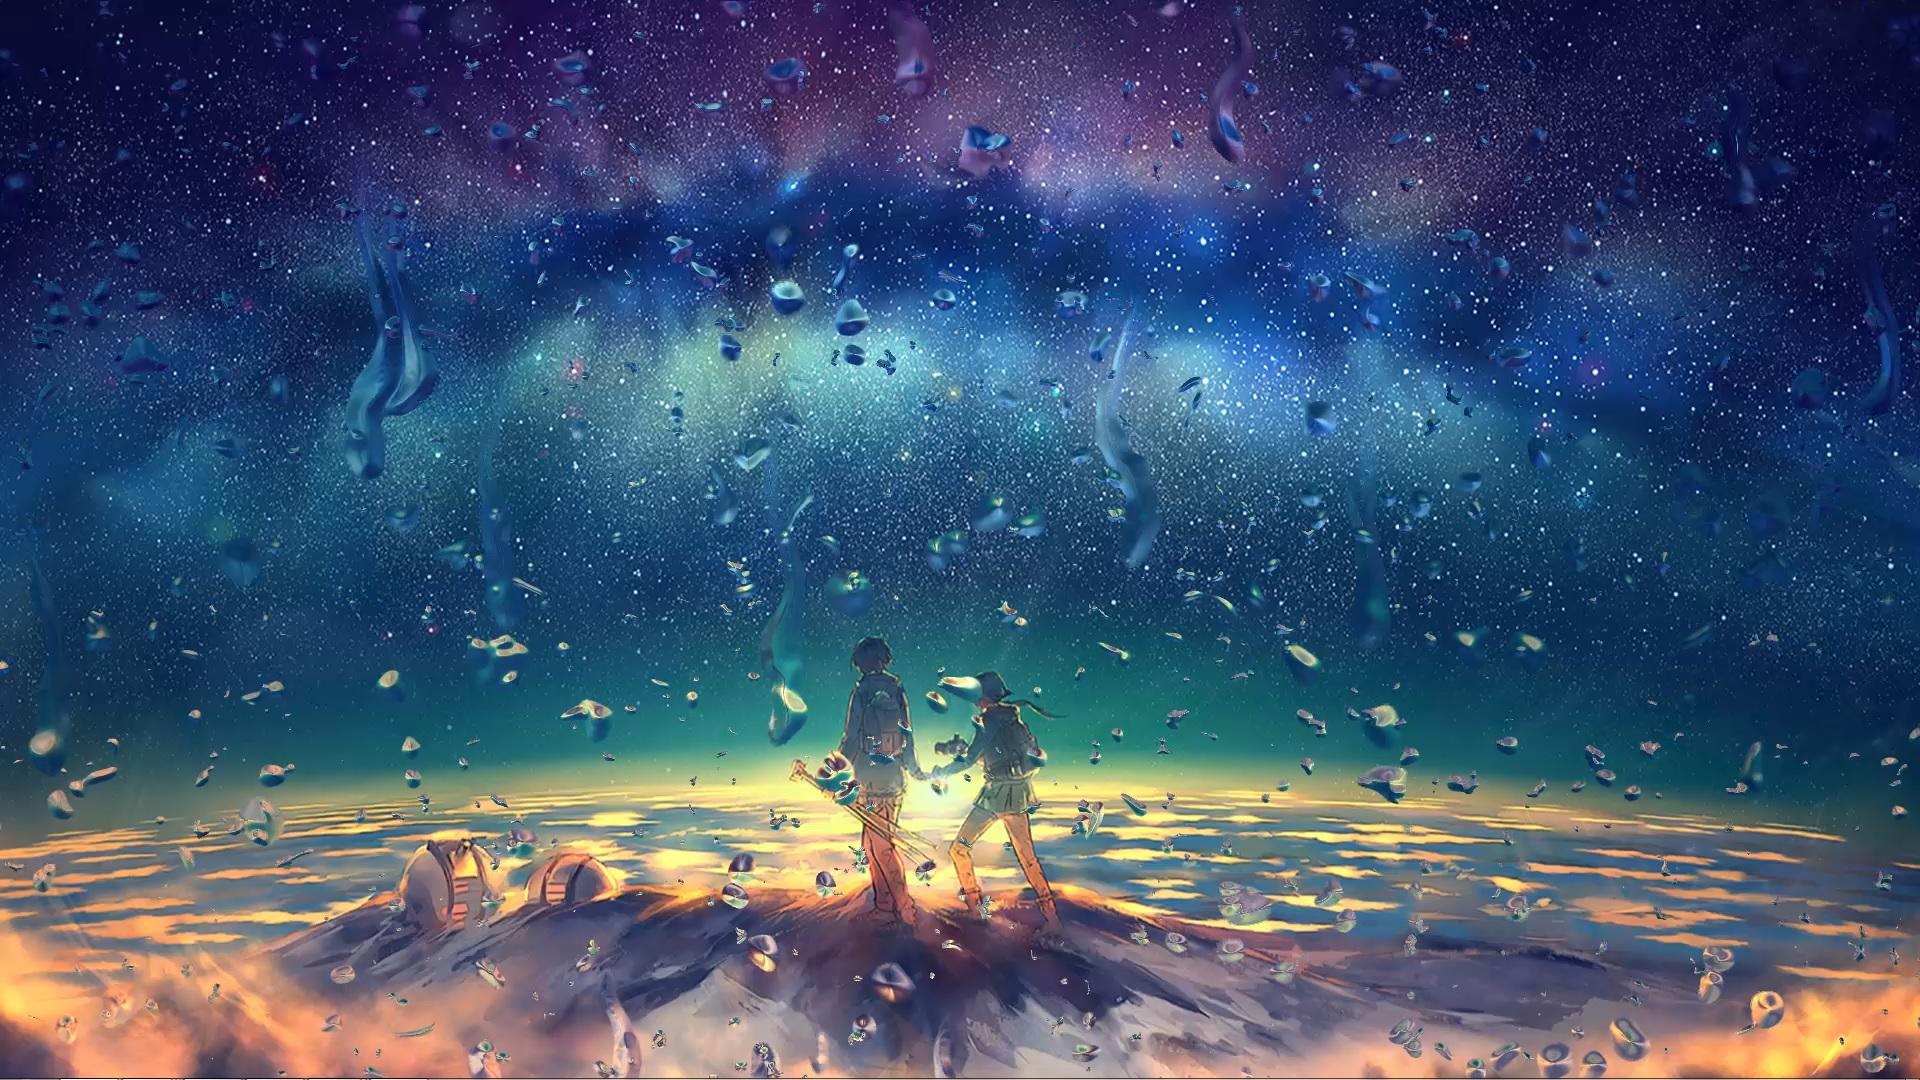 The Heavens Beneath